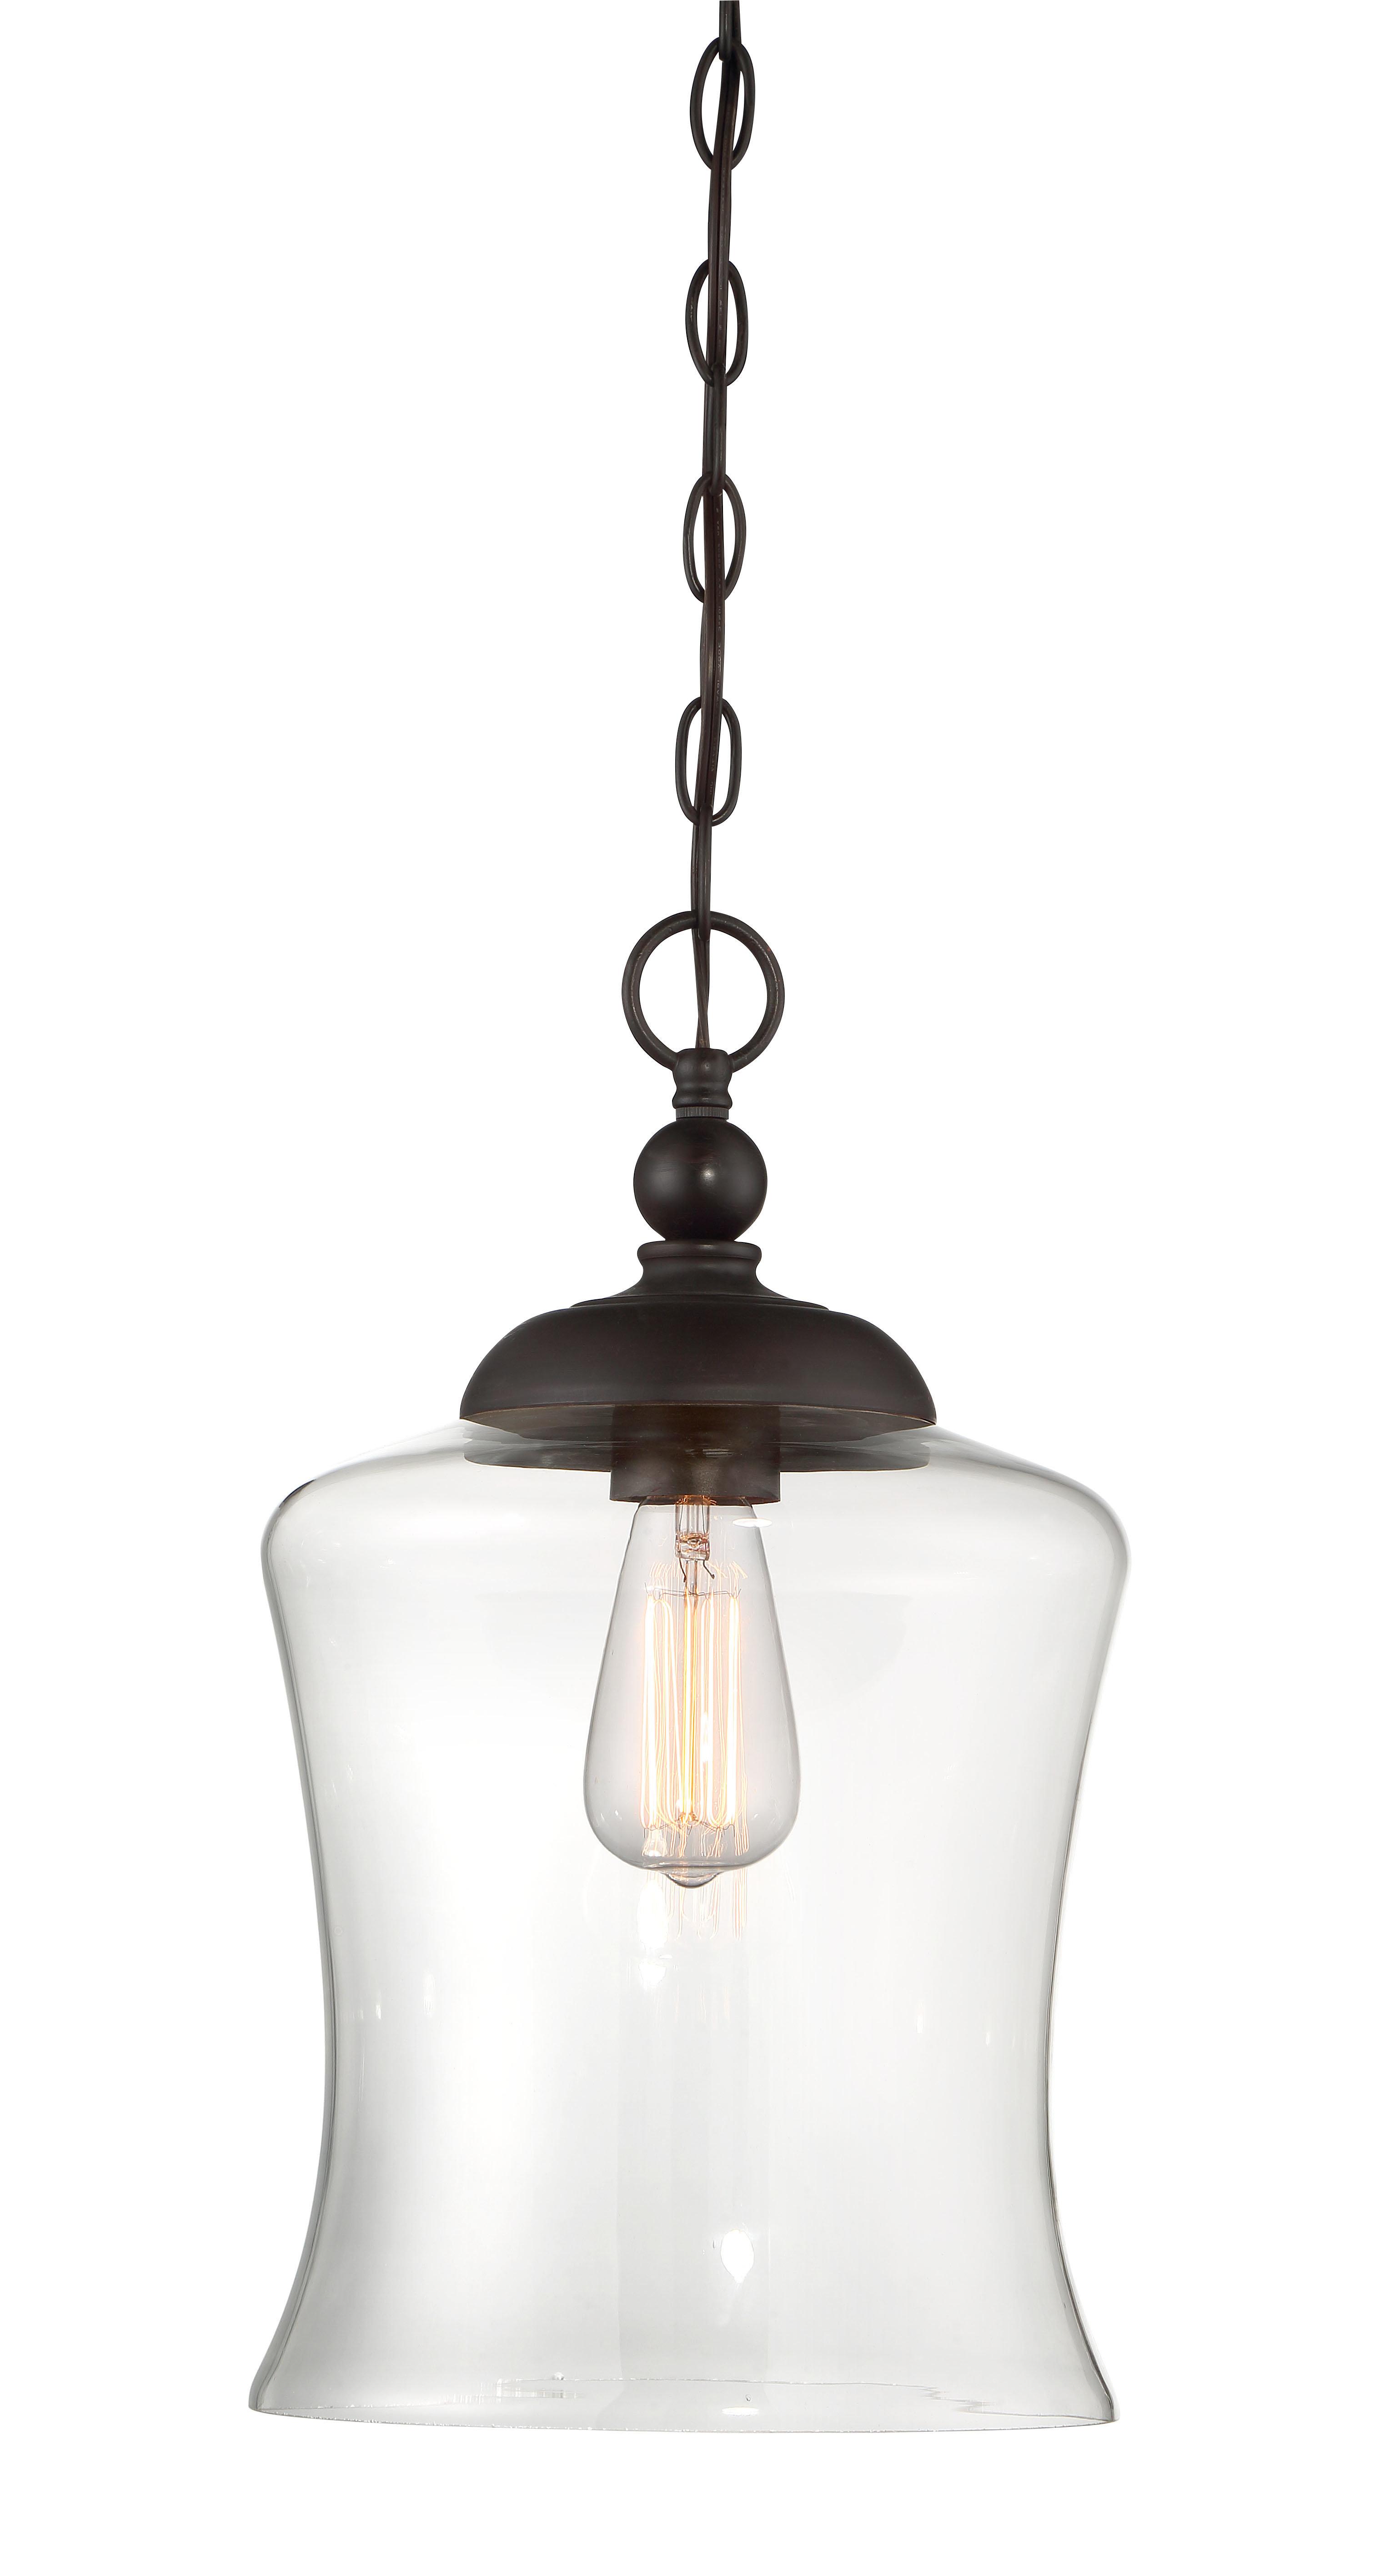 Wentzville 1 Light Single Bell Pendant Intended For Most Up To Date Carey 1 Light Single Bell Pendants (View 25 of 25)